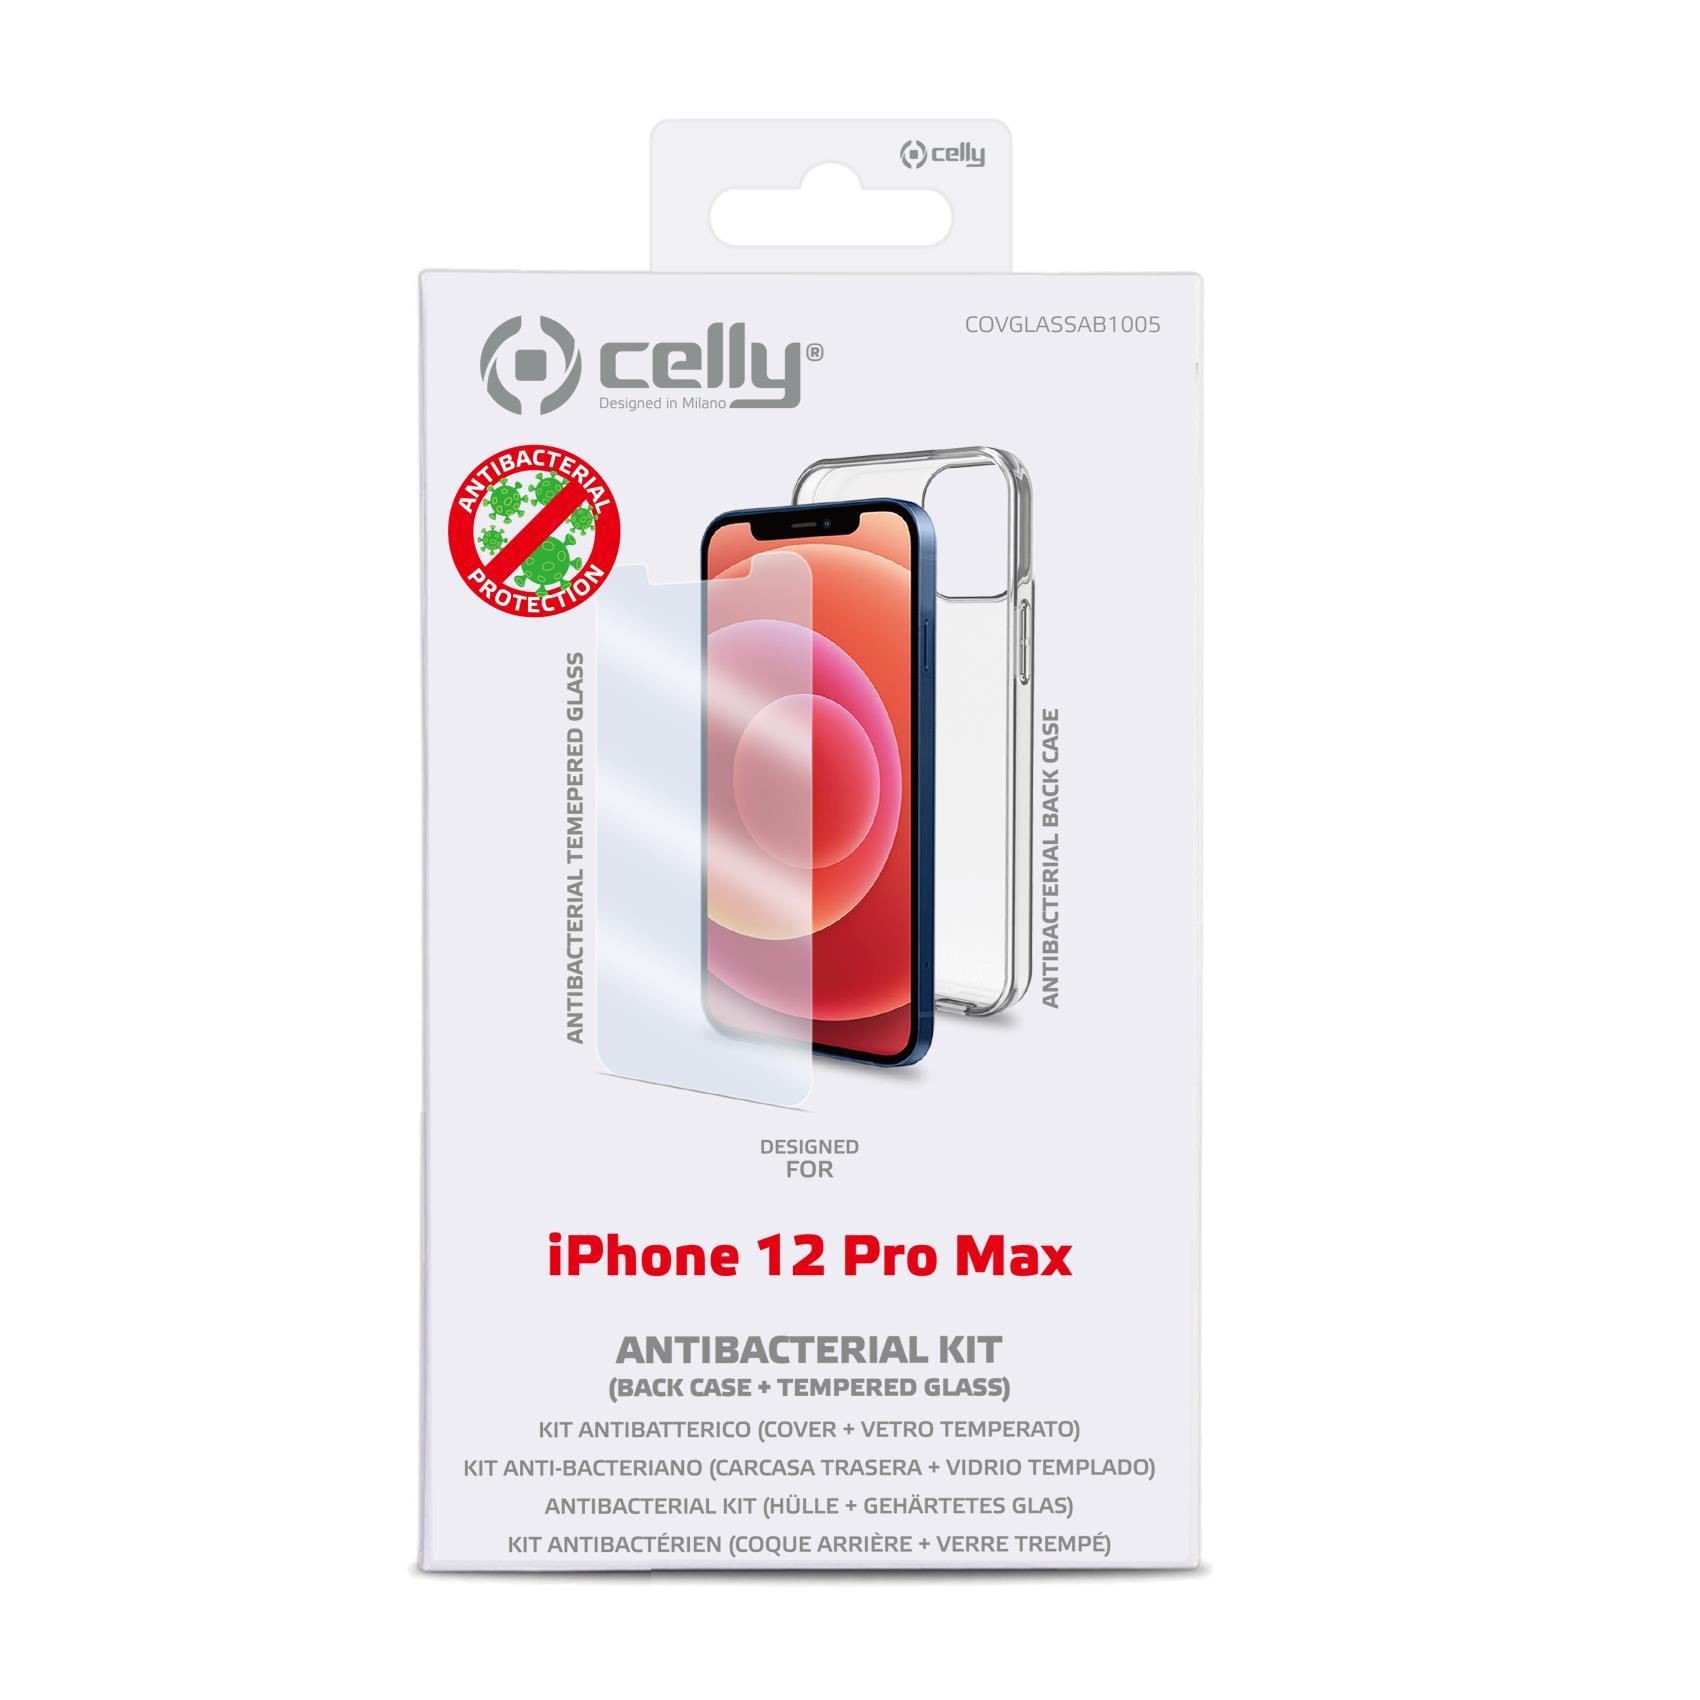 COVGLASSAB - iPhone 12 Pro Max